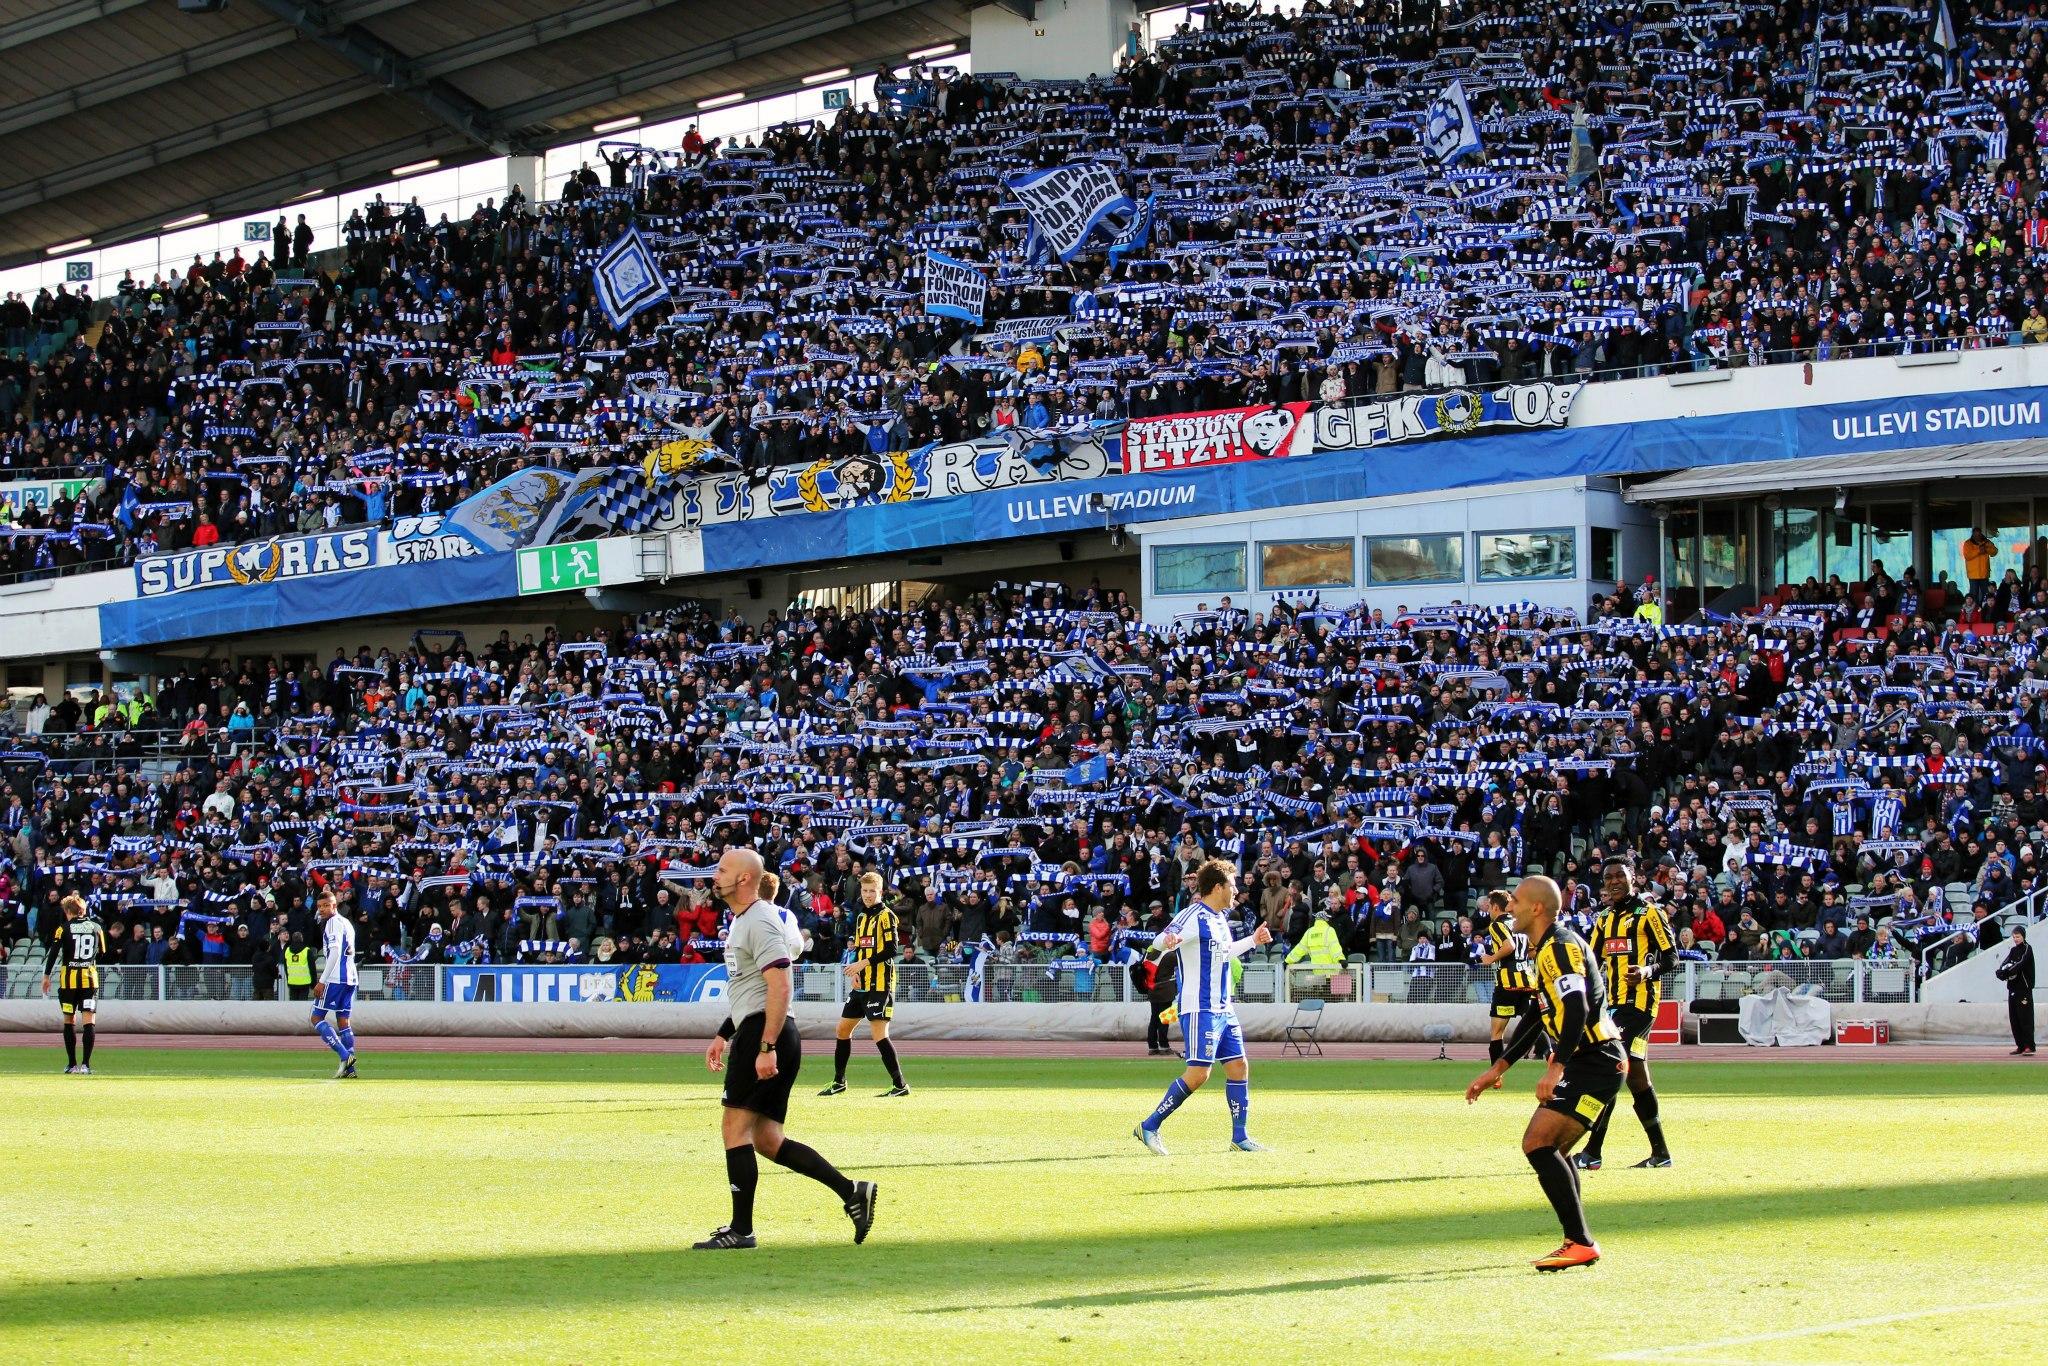 Ponturi pariuri – Djurgarden vs Goteborg – Allsvenskan